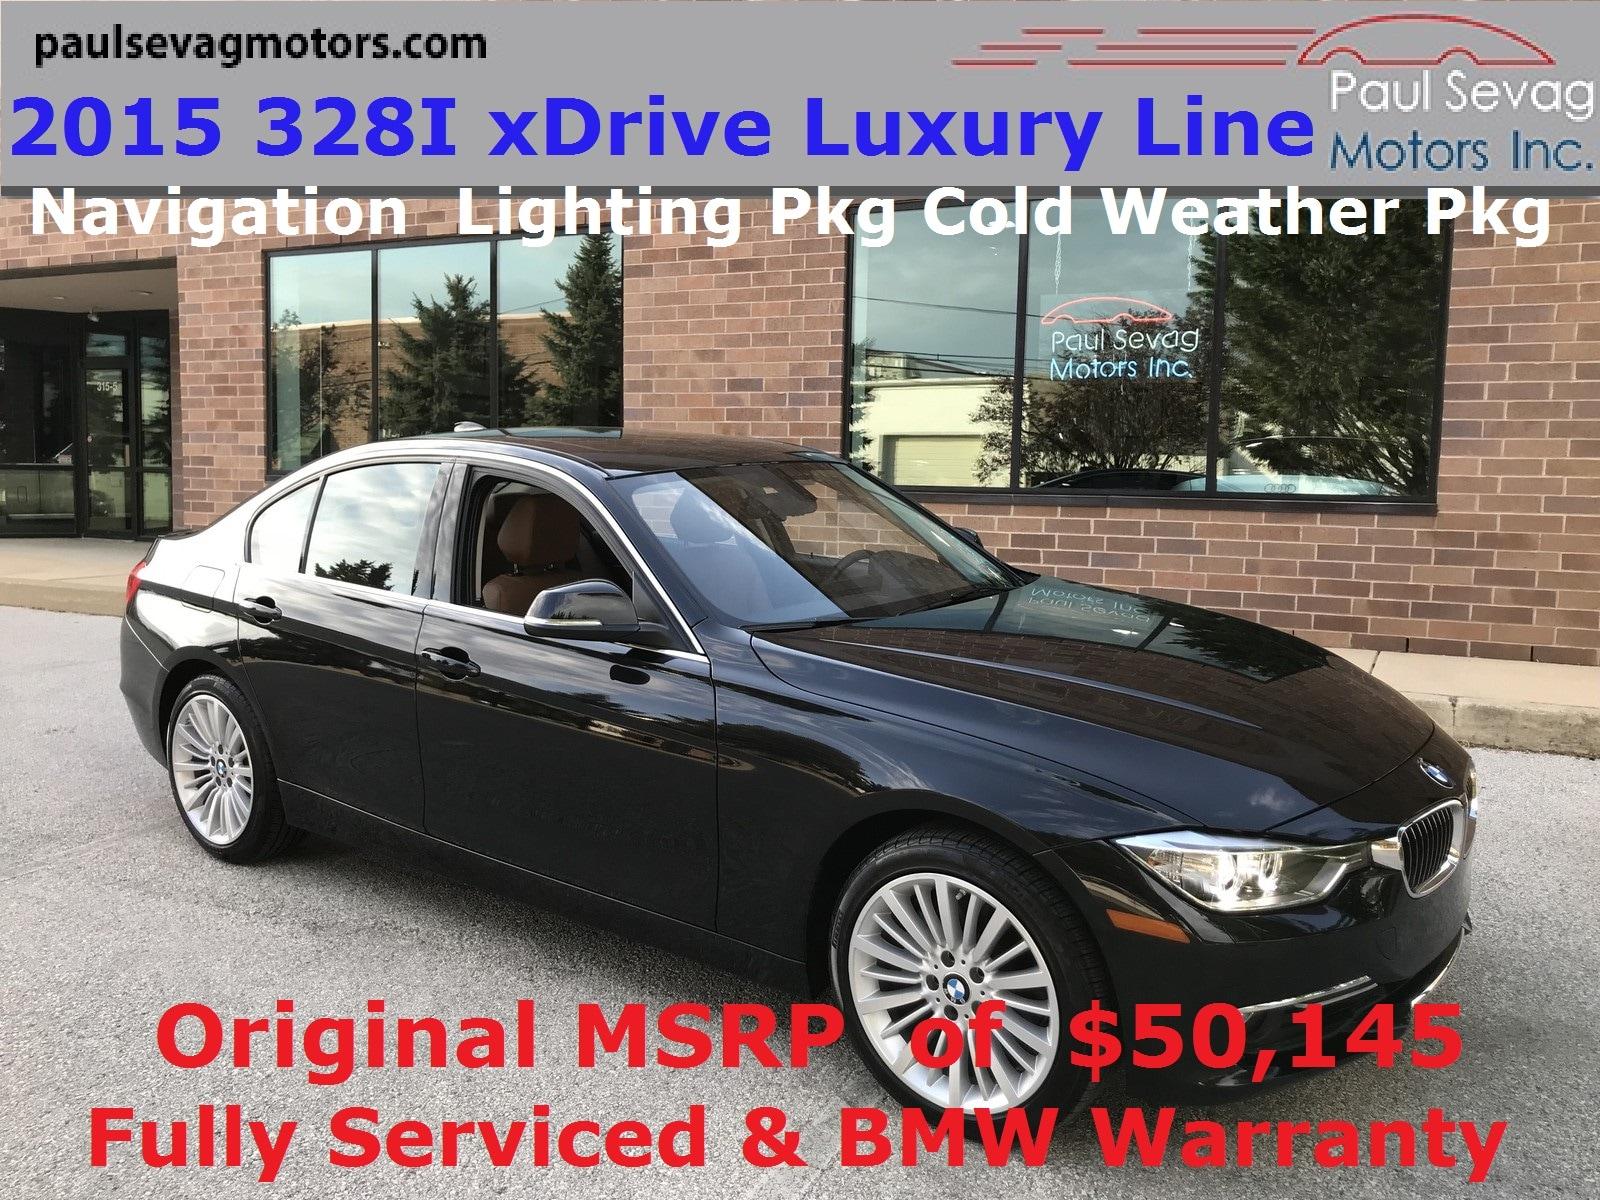 2015 BMW 328i xDrive Luxury Line Sedan Navigation/Lighting Pkg/MSRP $50,145 Sedan